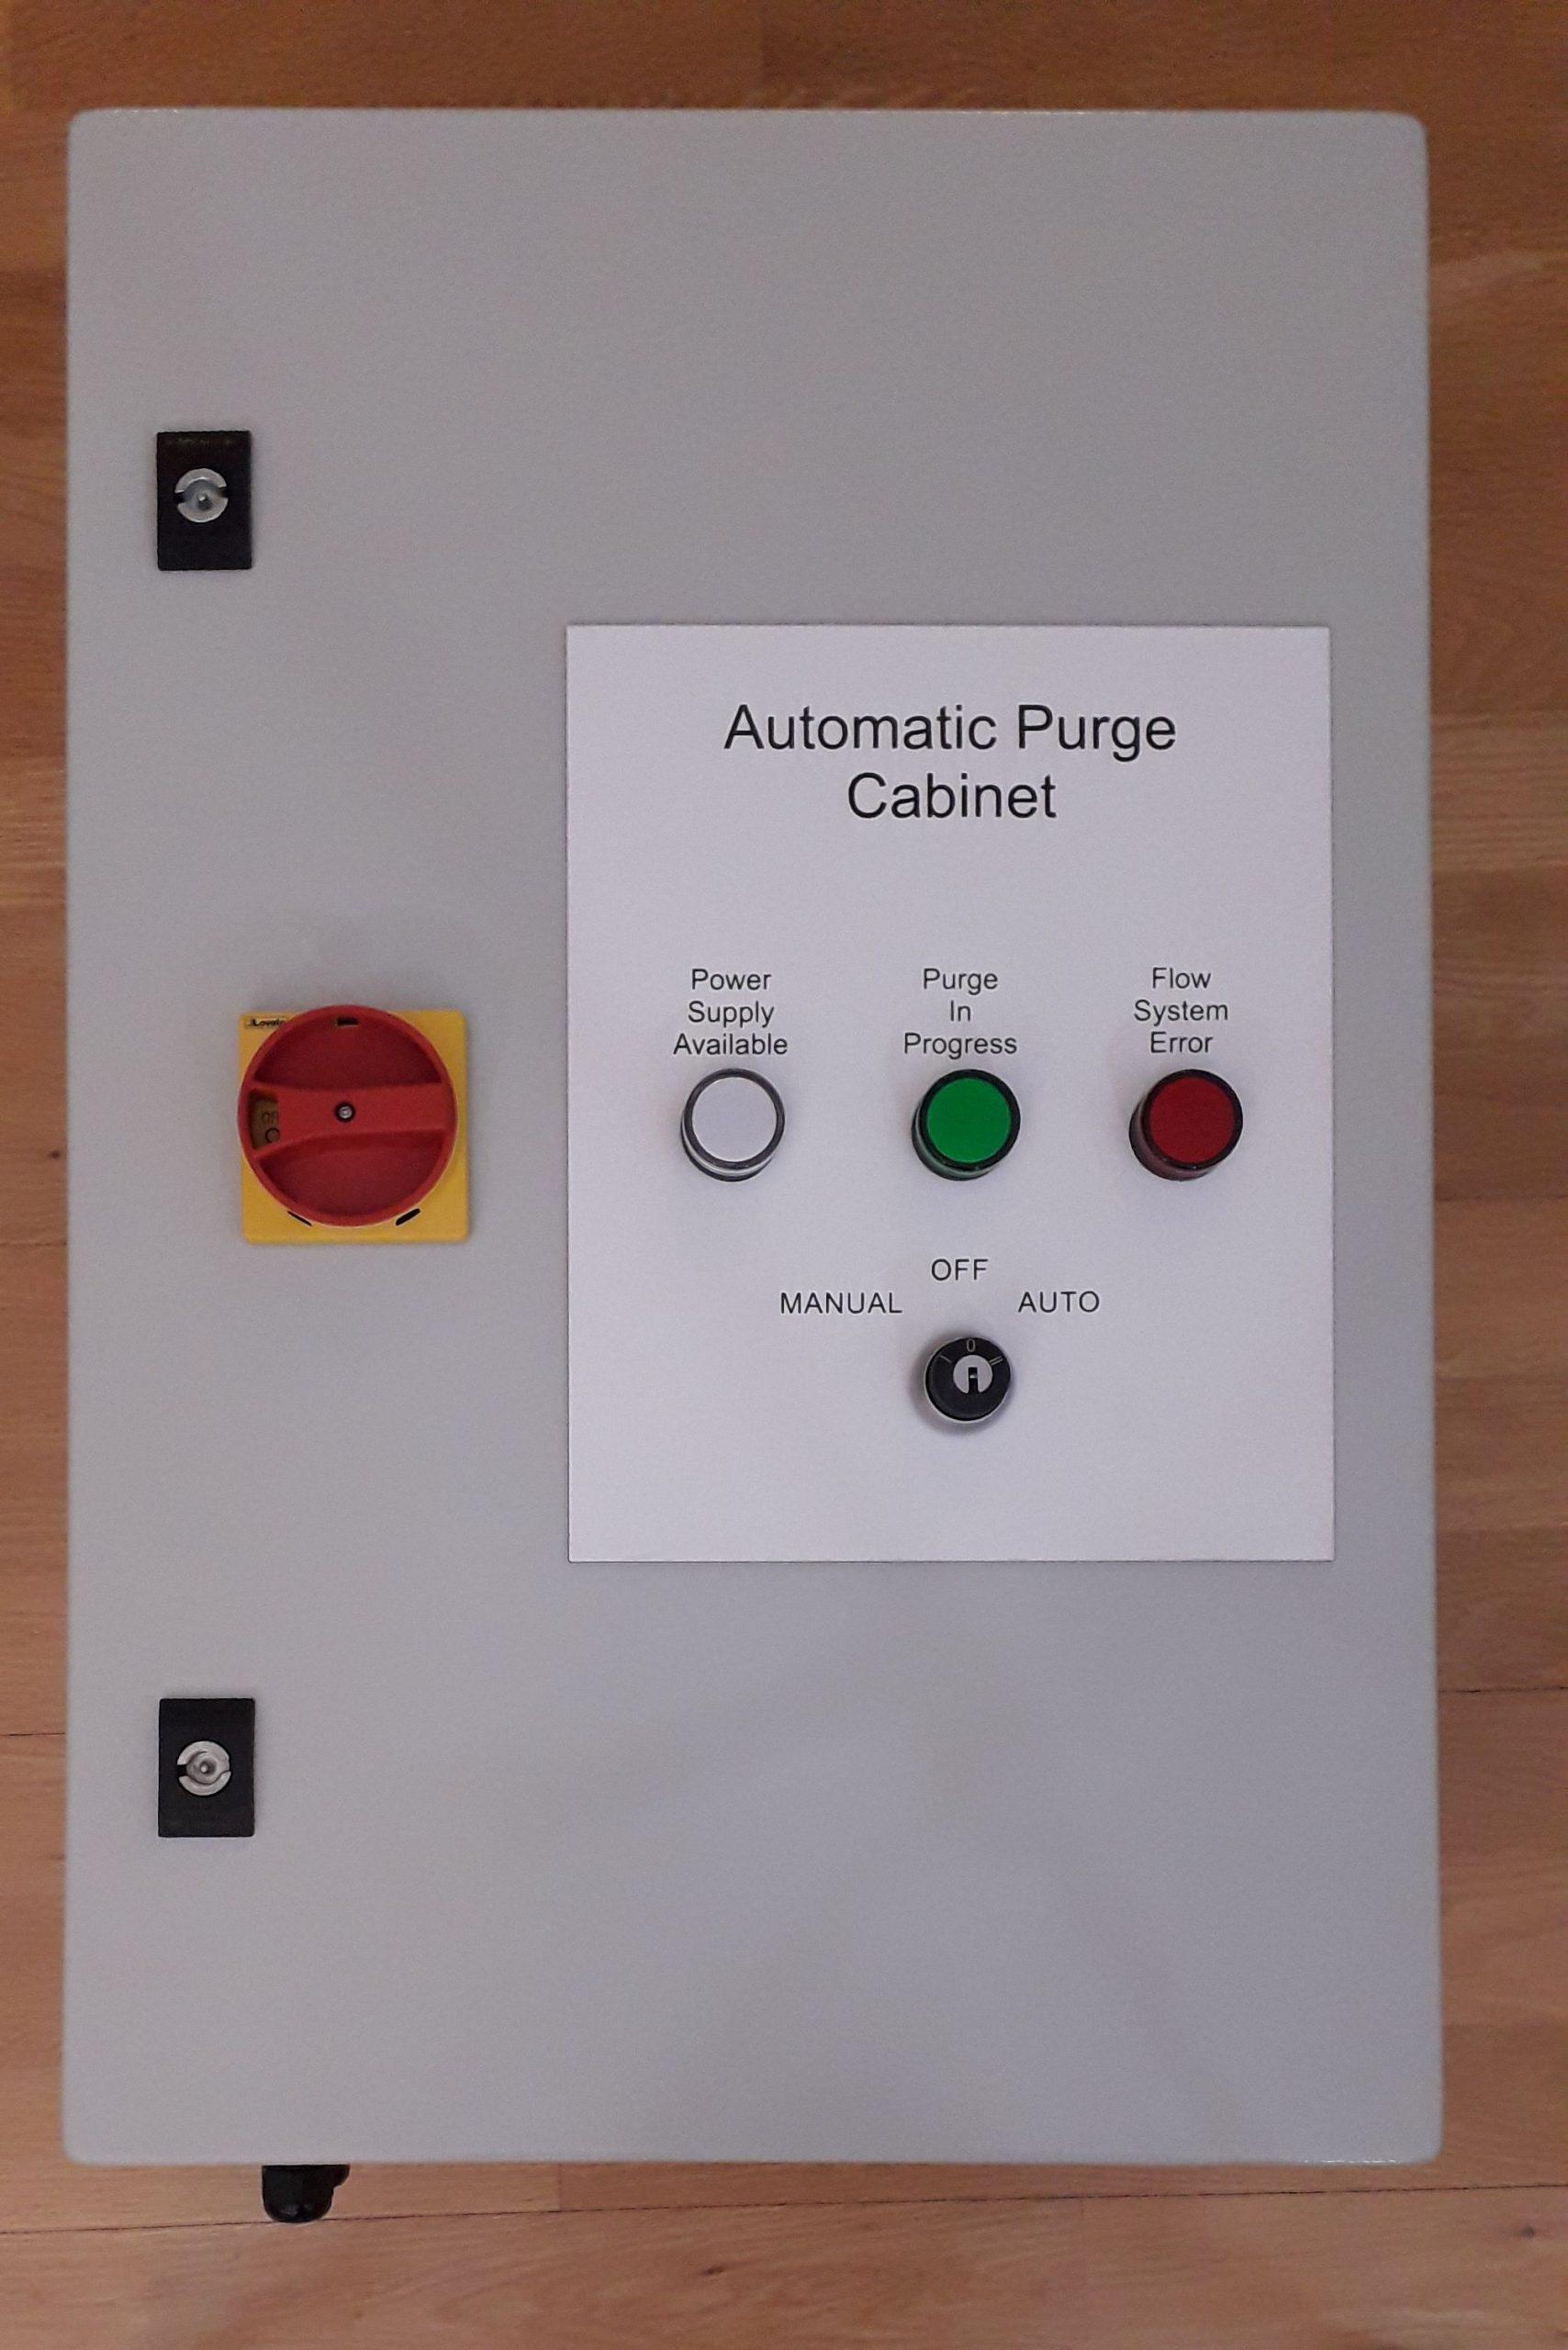 Automatic Purge Cabinet